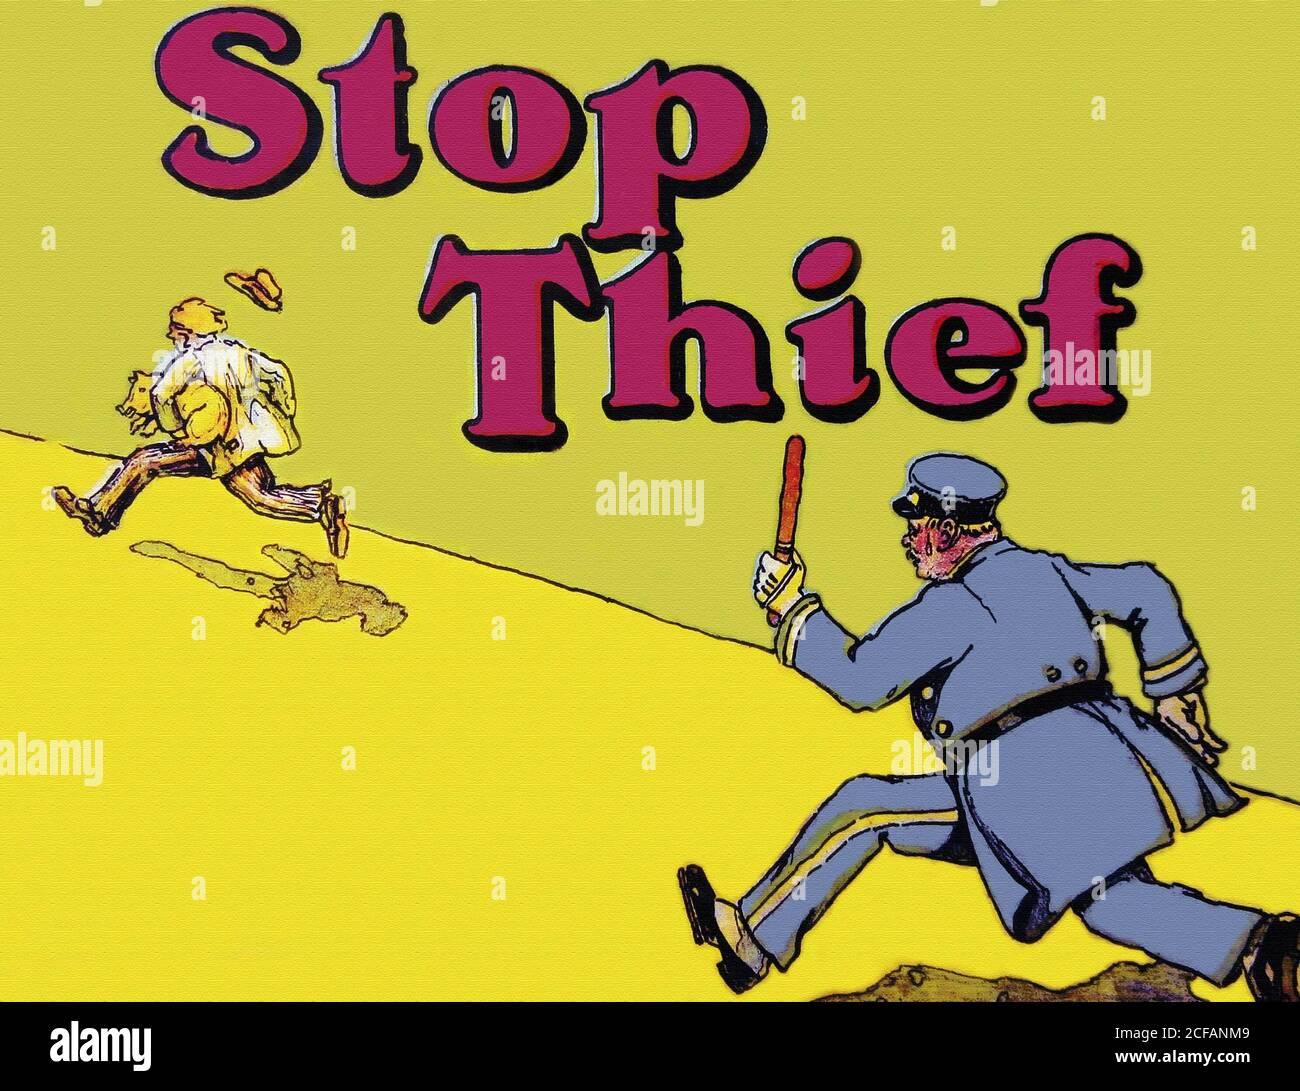 Stop Thief! Stock Photo - Alamy